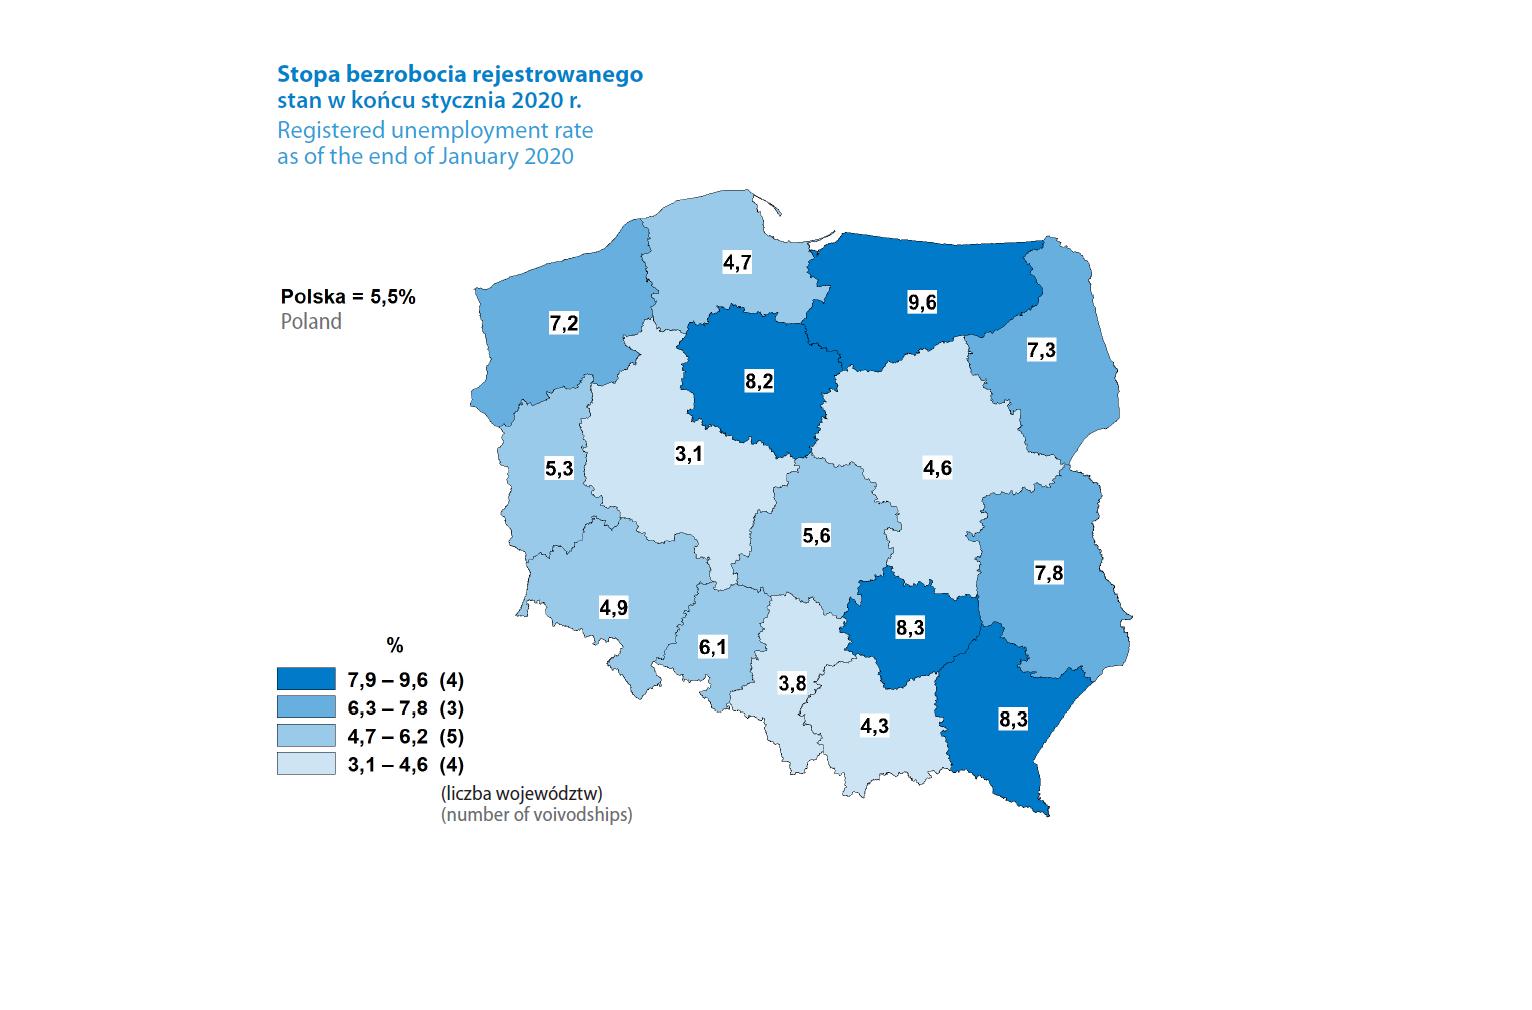 (Źródło: GUS/stat.gov.pl)